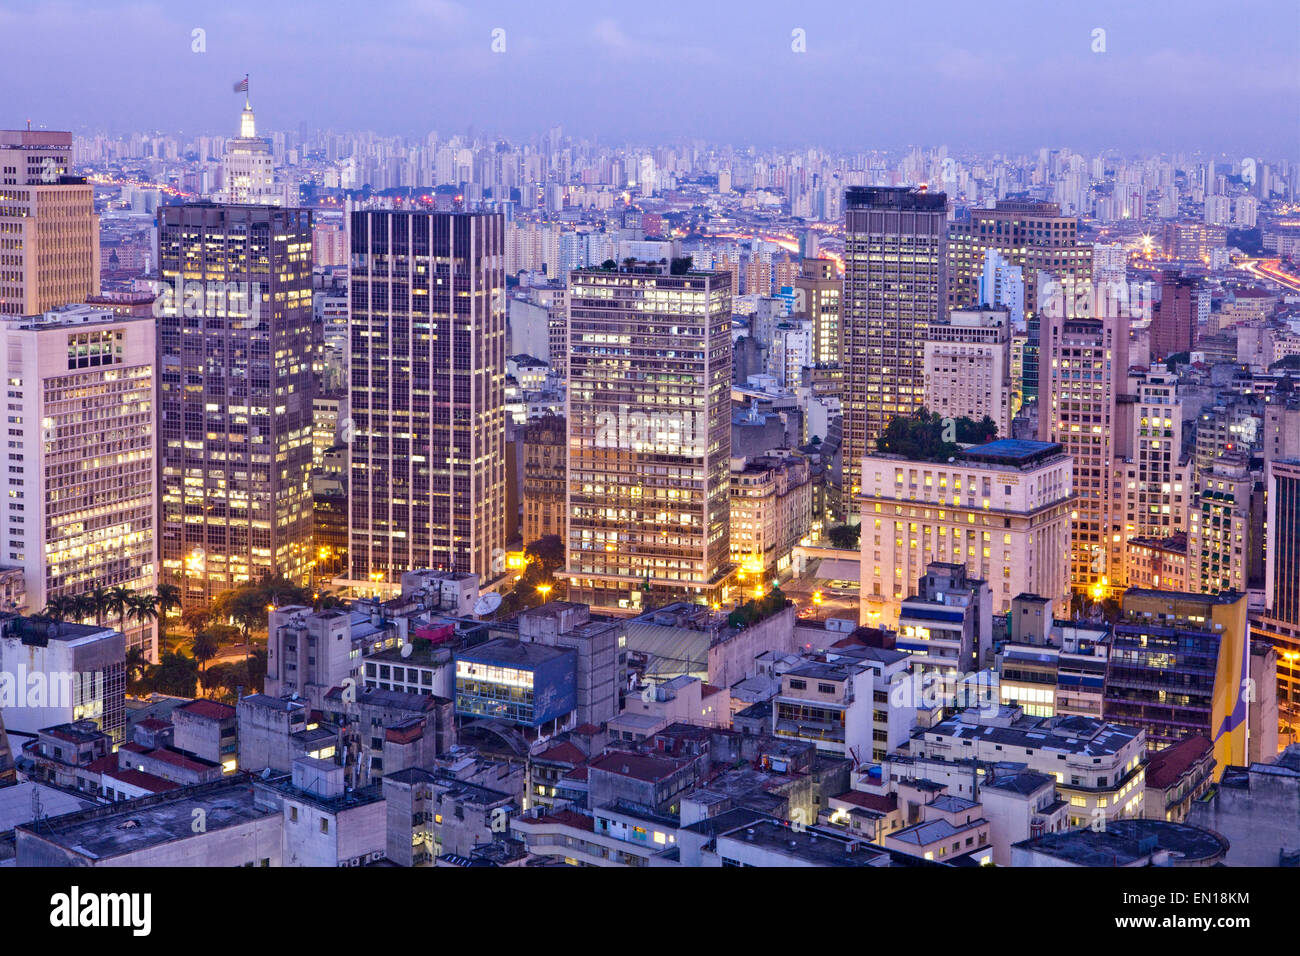 Geographie/Reisen, Amerika, Süd Amerika, Brasilien, Sao Paulo, Stadtzentrum Stockbild